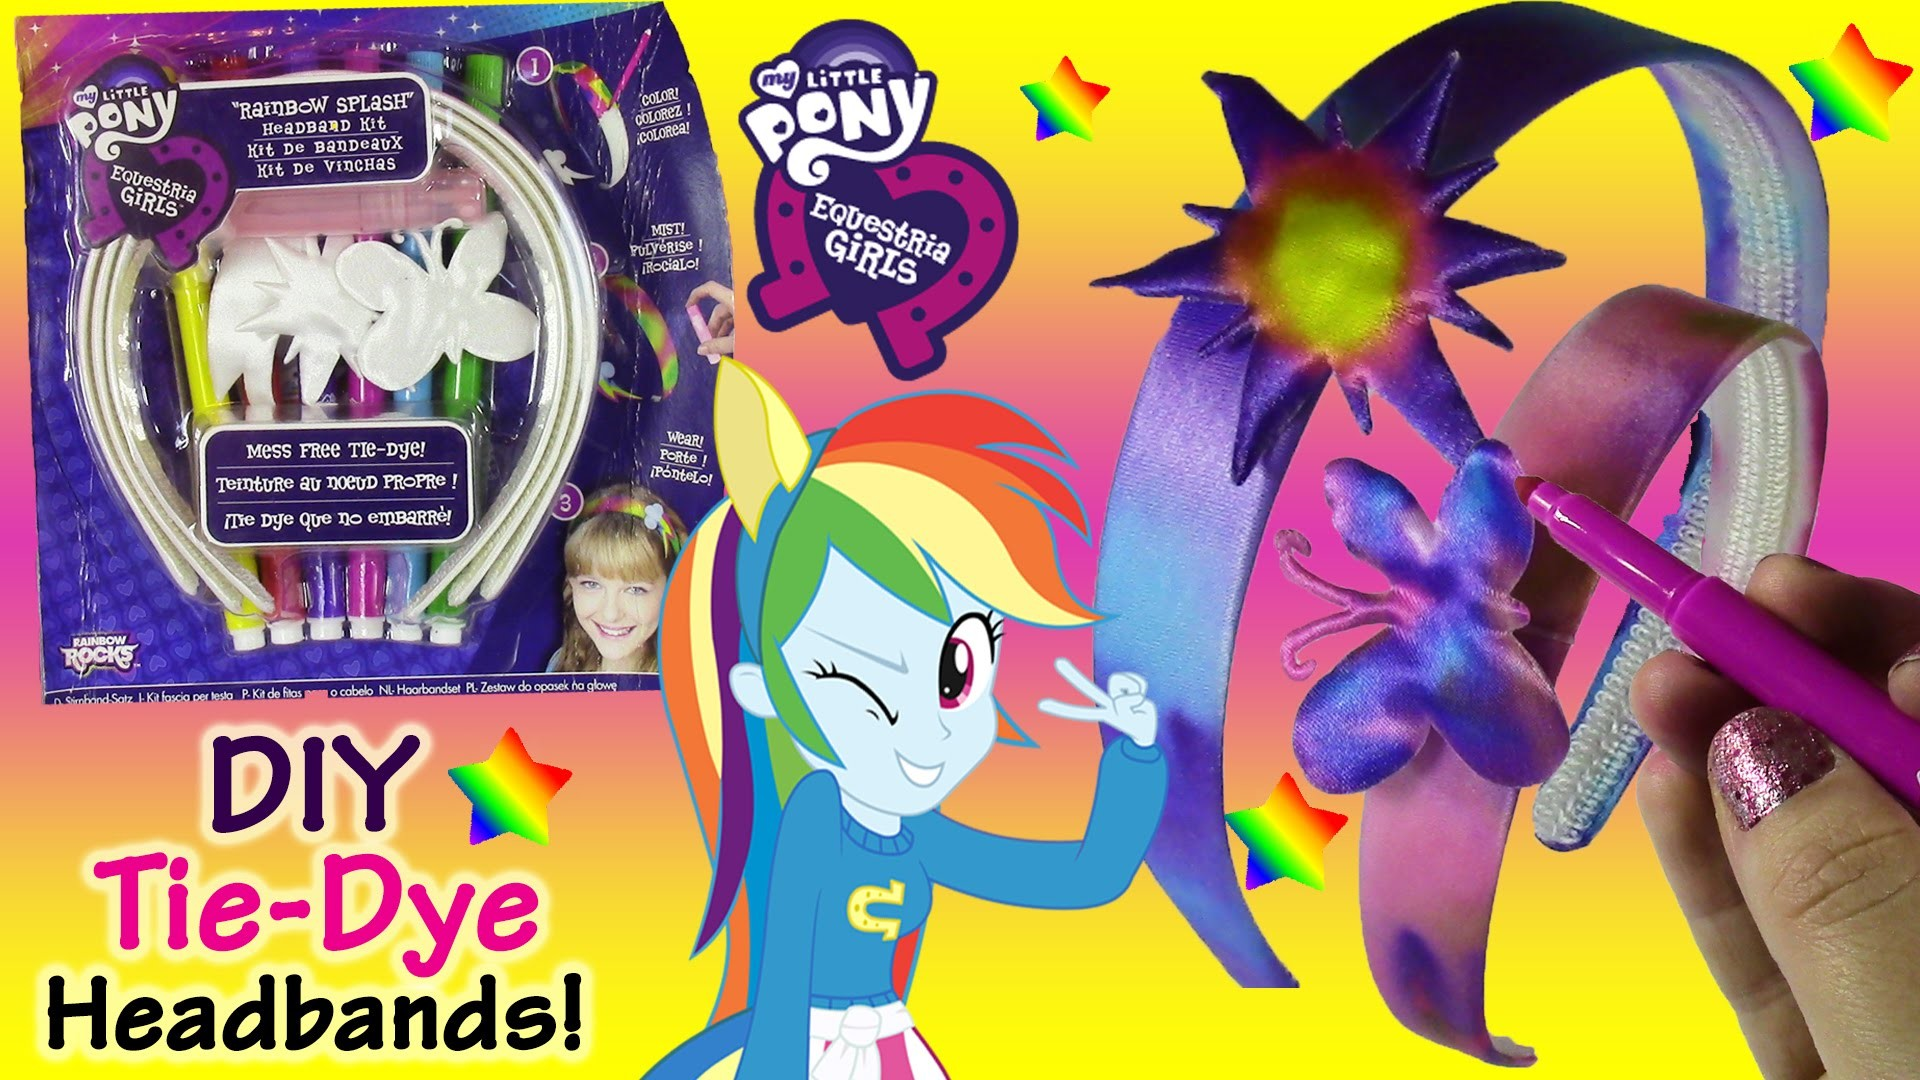 MLP Equestria Girls DIY Rainbow Splash Tie-Dye Headband Kit! Color & Spray with Water! Lip Gloss!